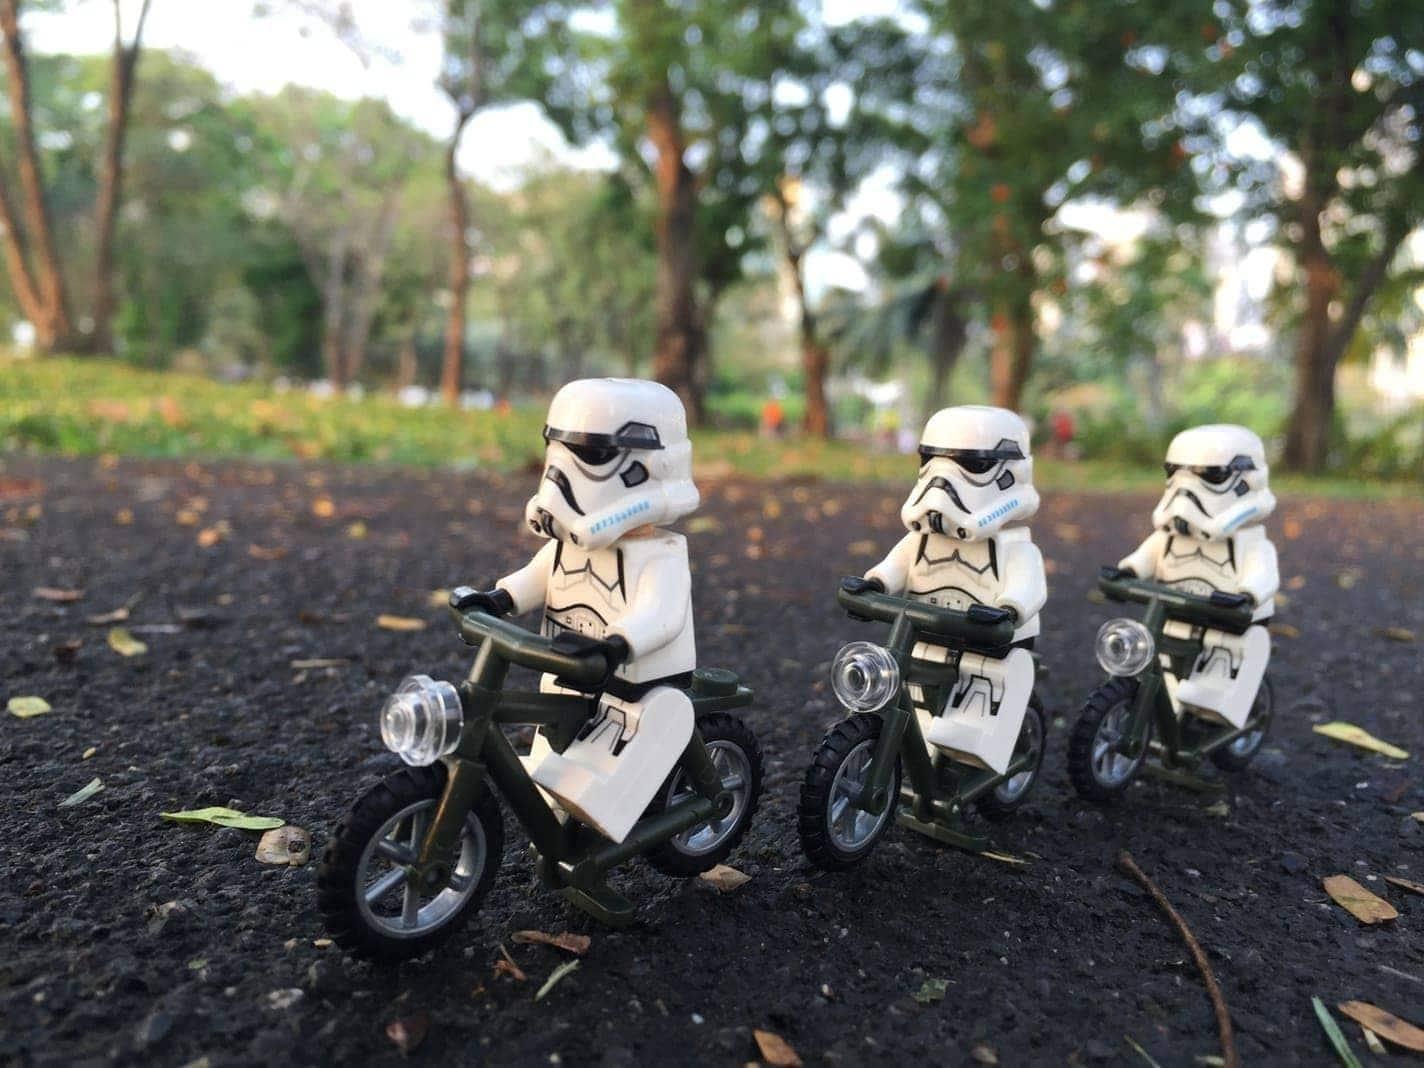 Star Wars Stormtrooper Lego